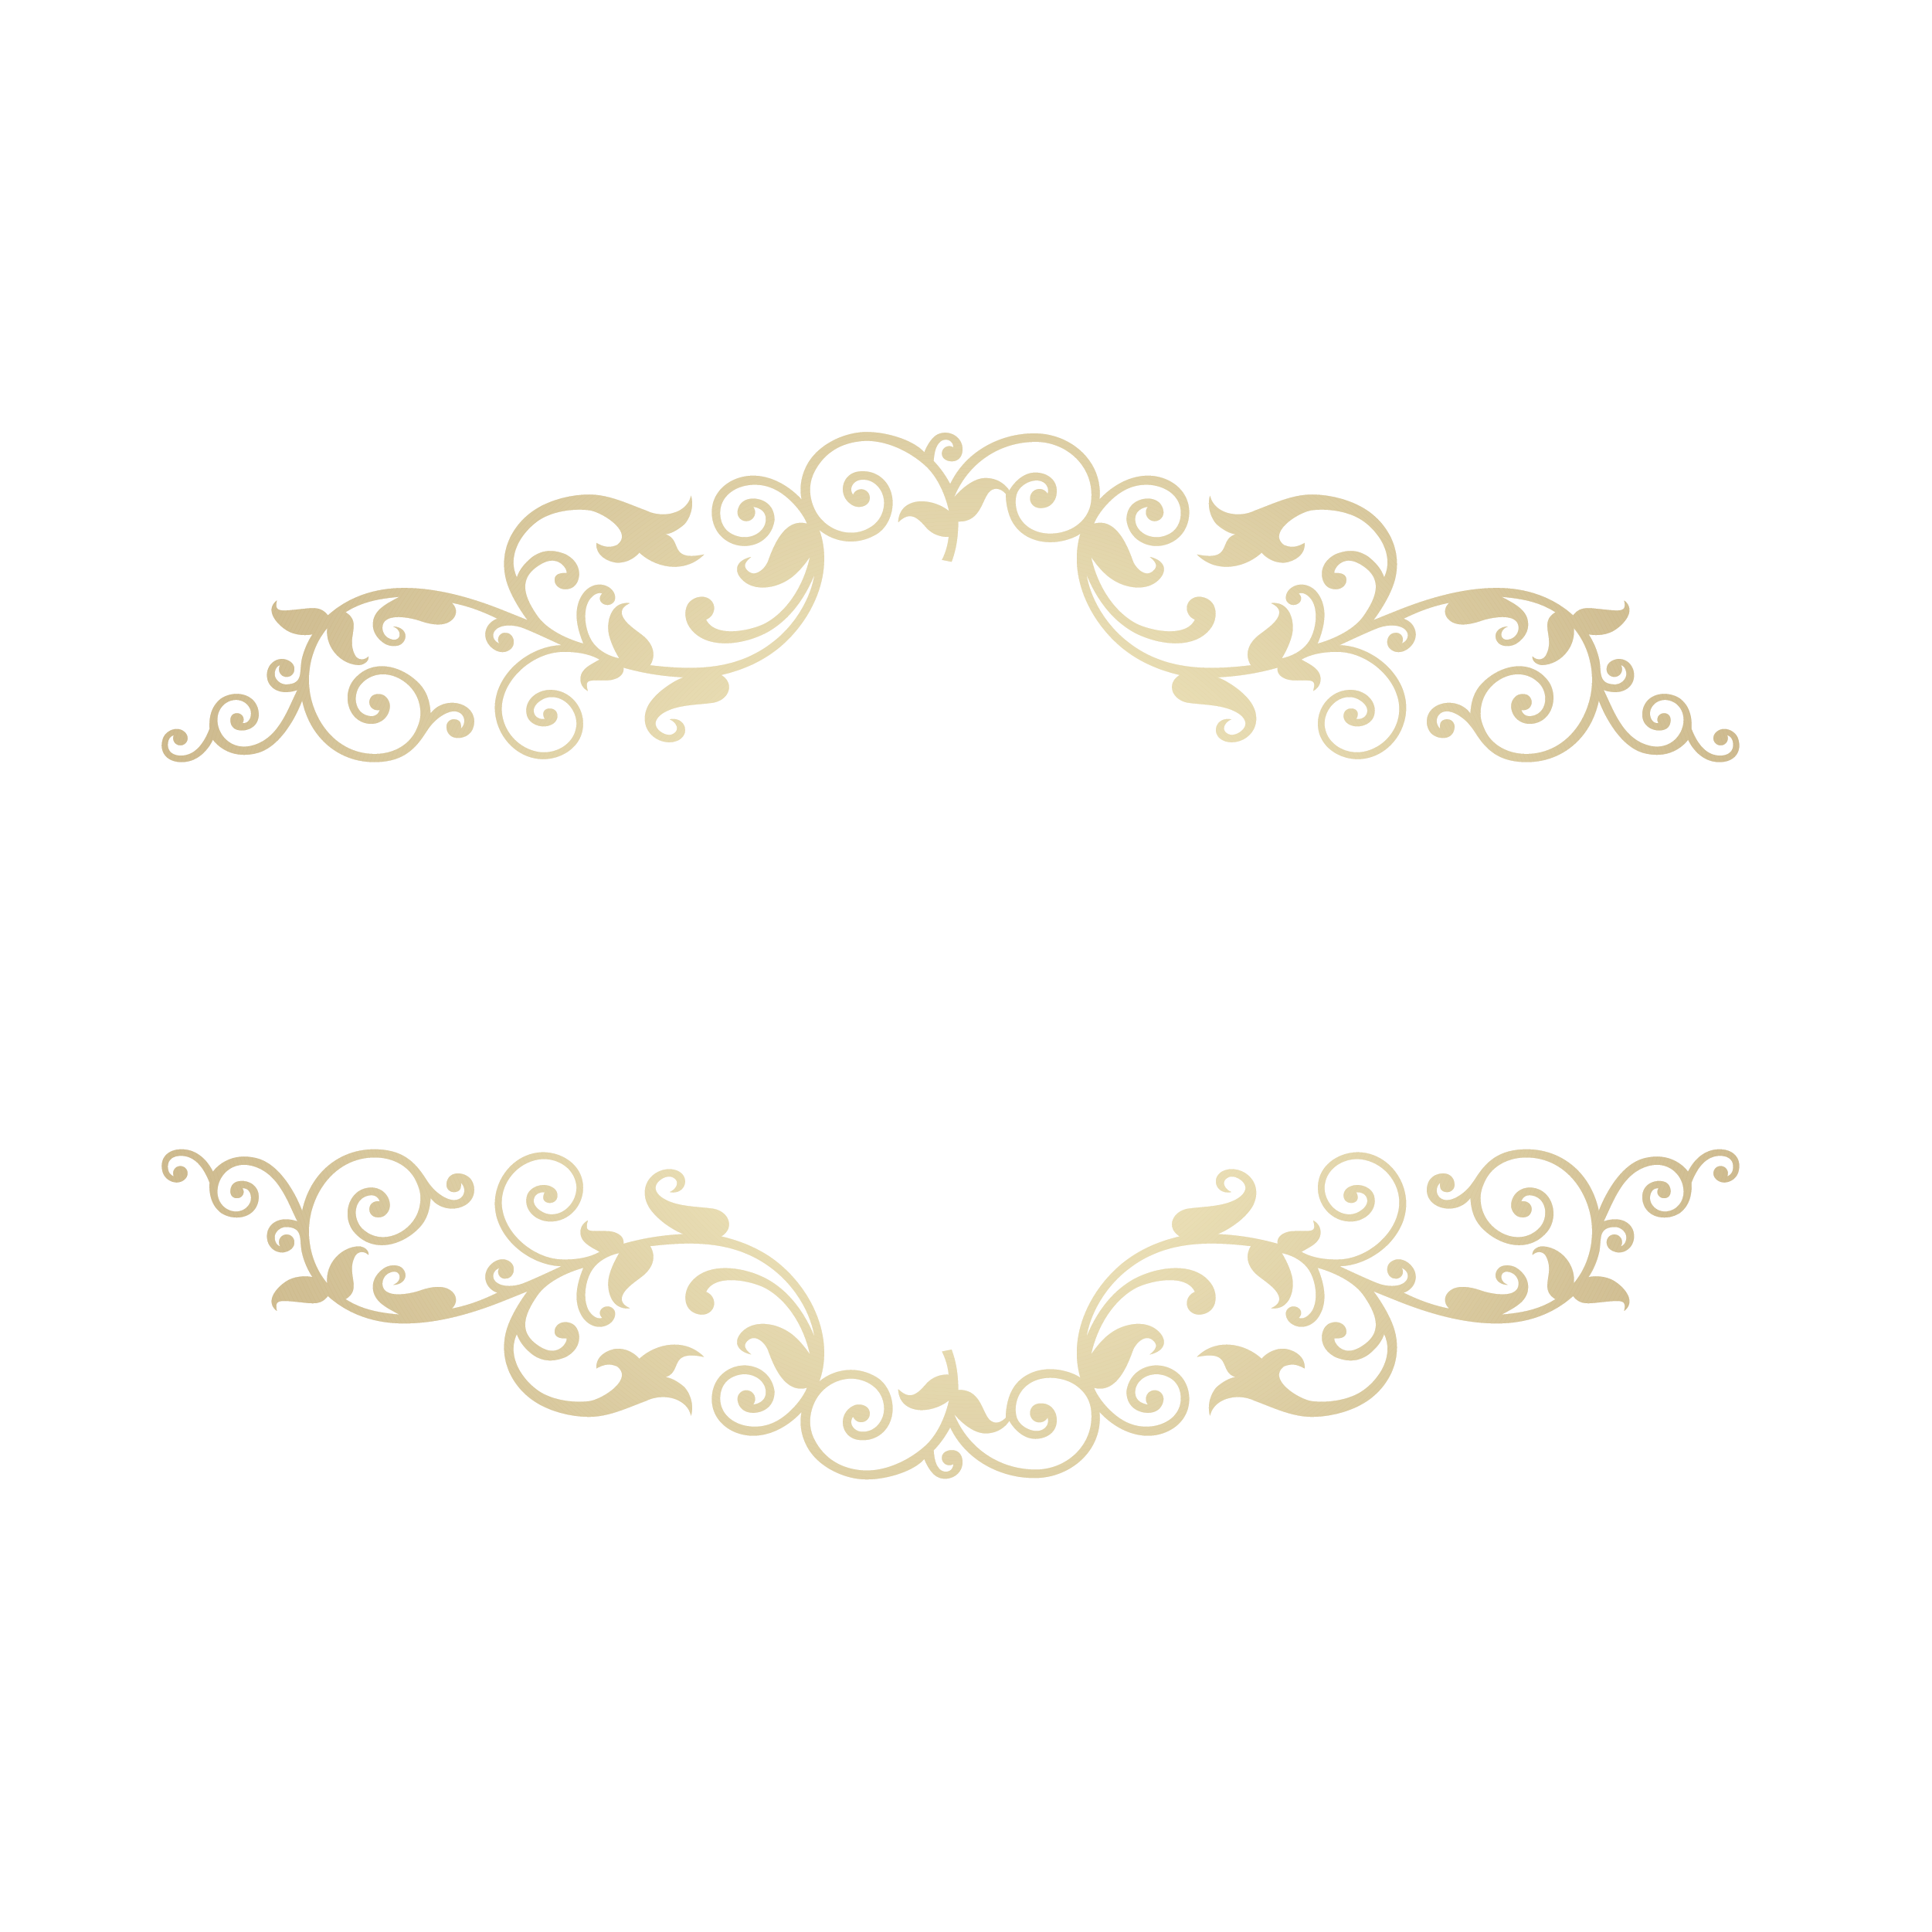 Clipart wedding pattern. Download flower yellow texture